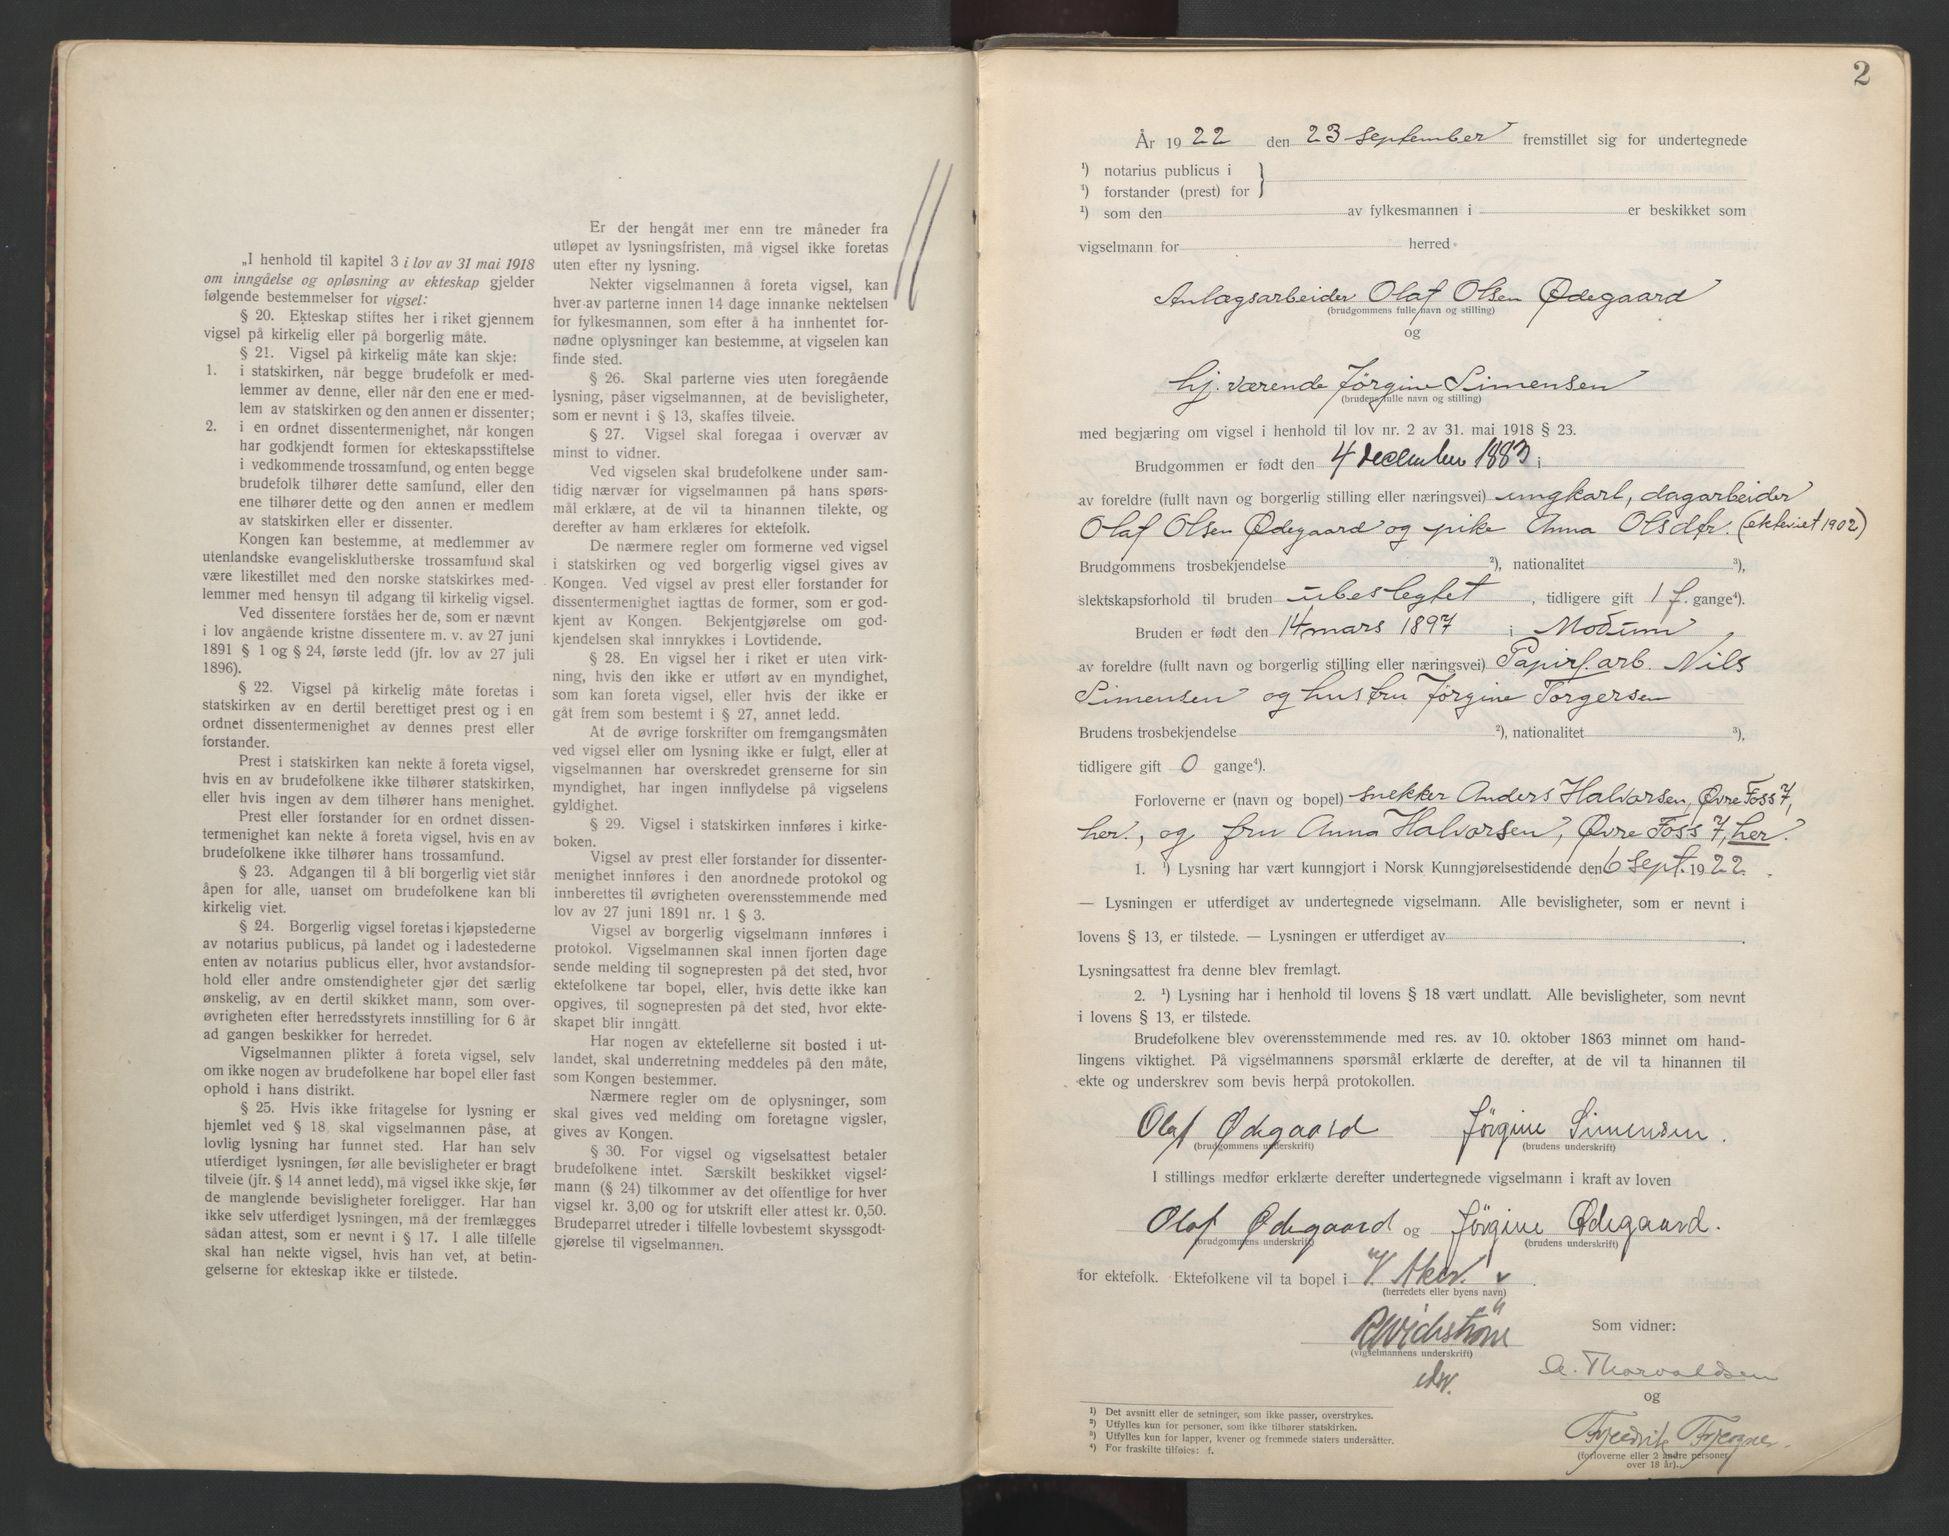 SAO, Aker sorenskriveri, L/Lc/Lcb/L0002: Vigselprotokoll, 1922-1924, s. 2